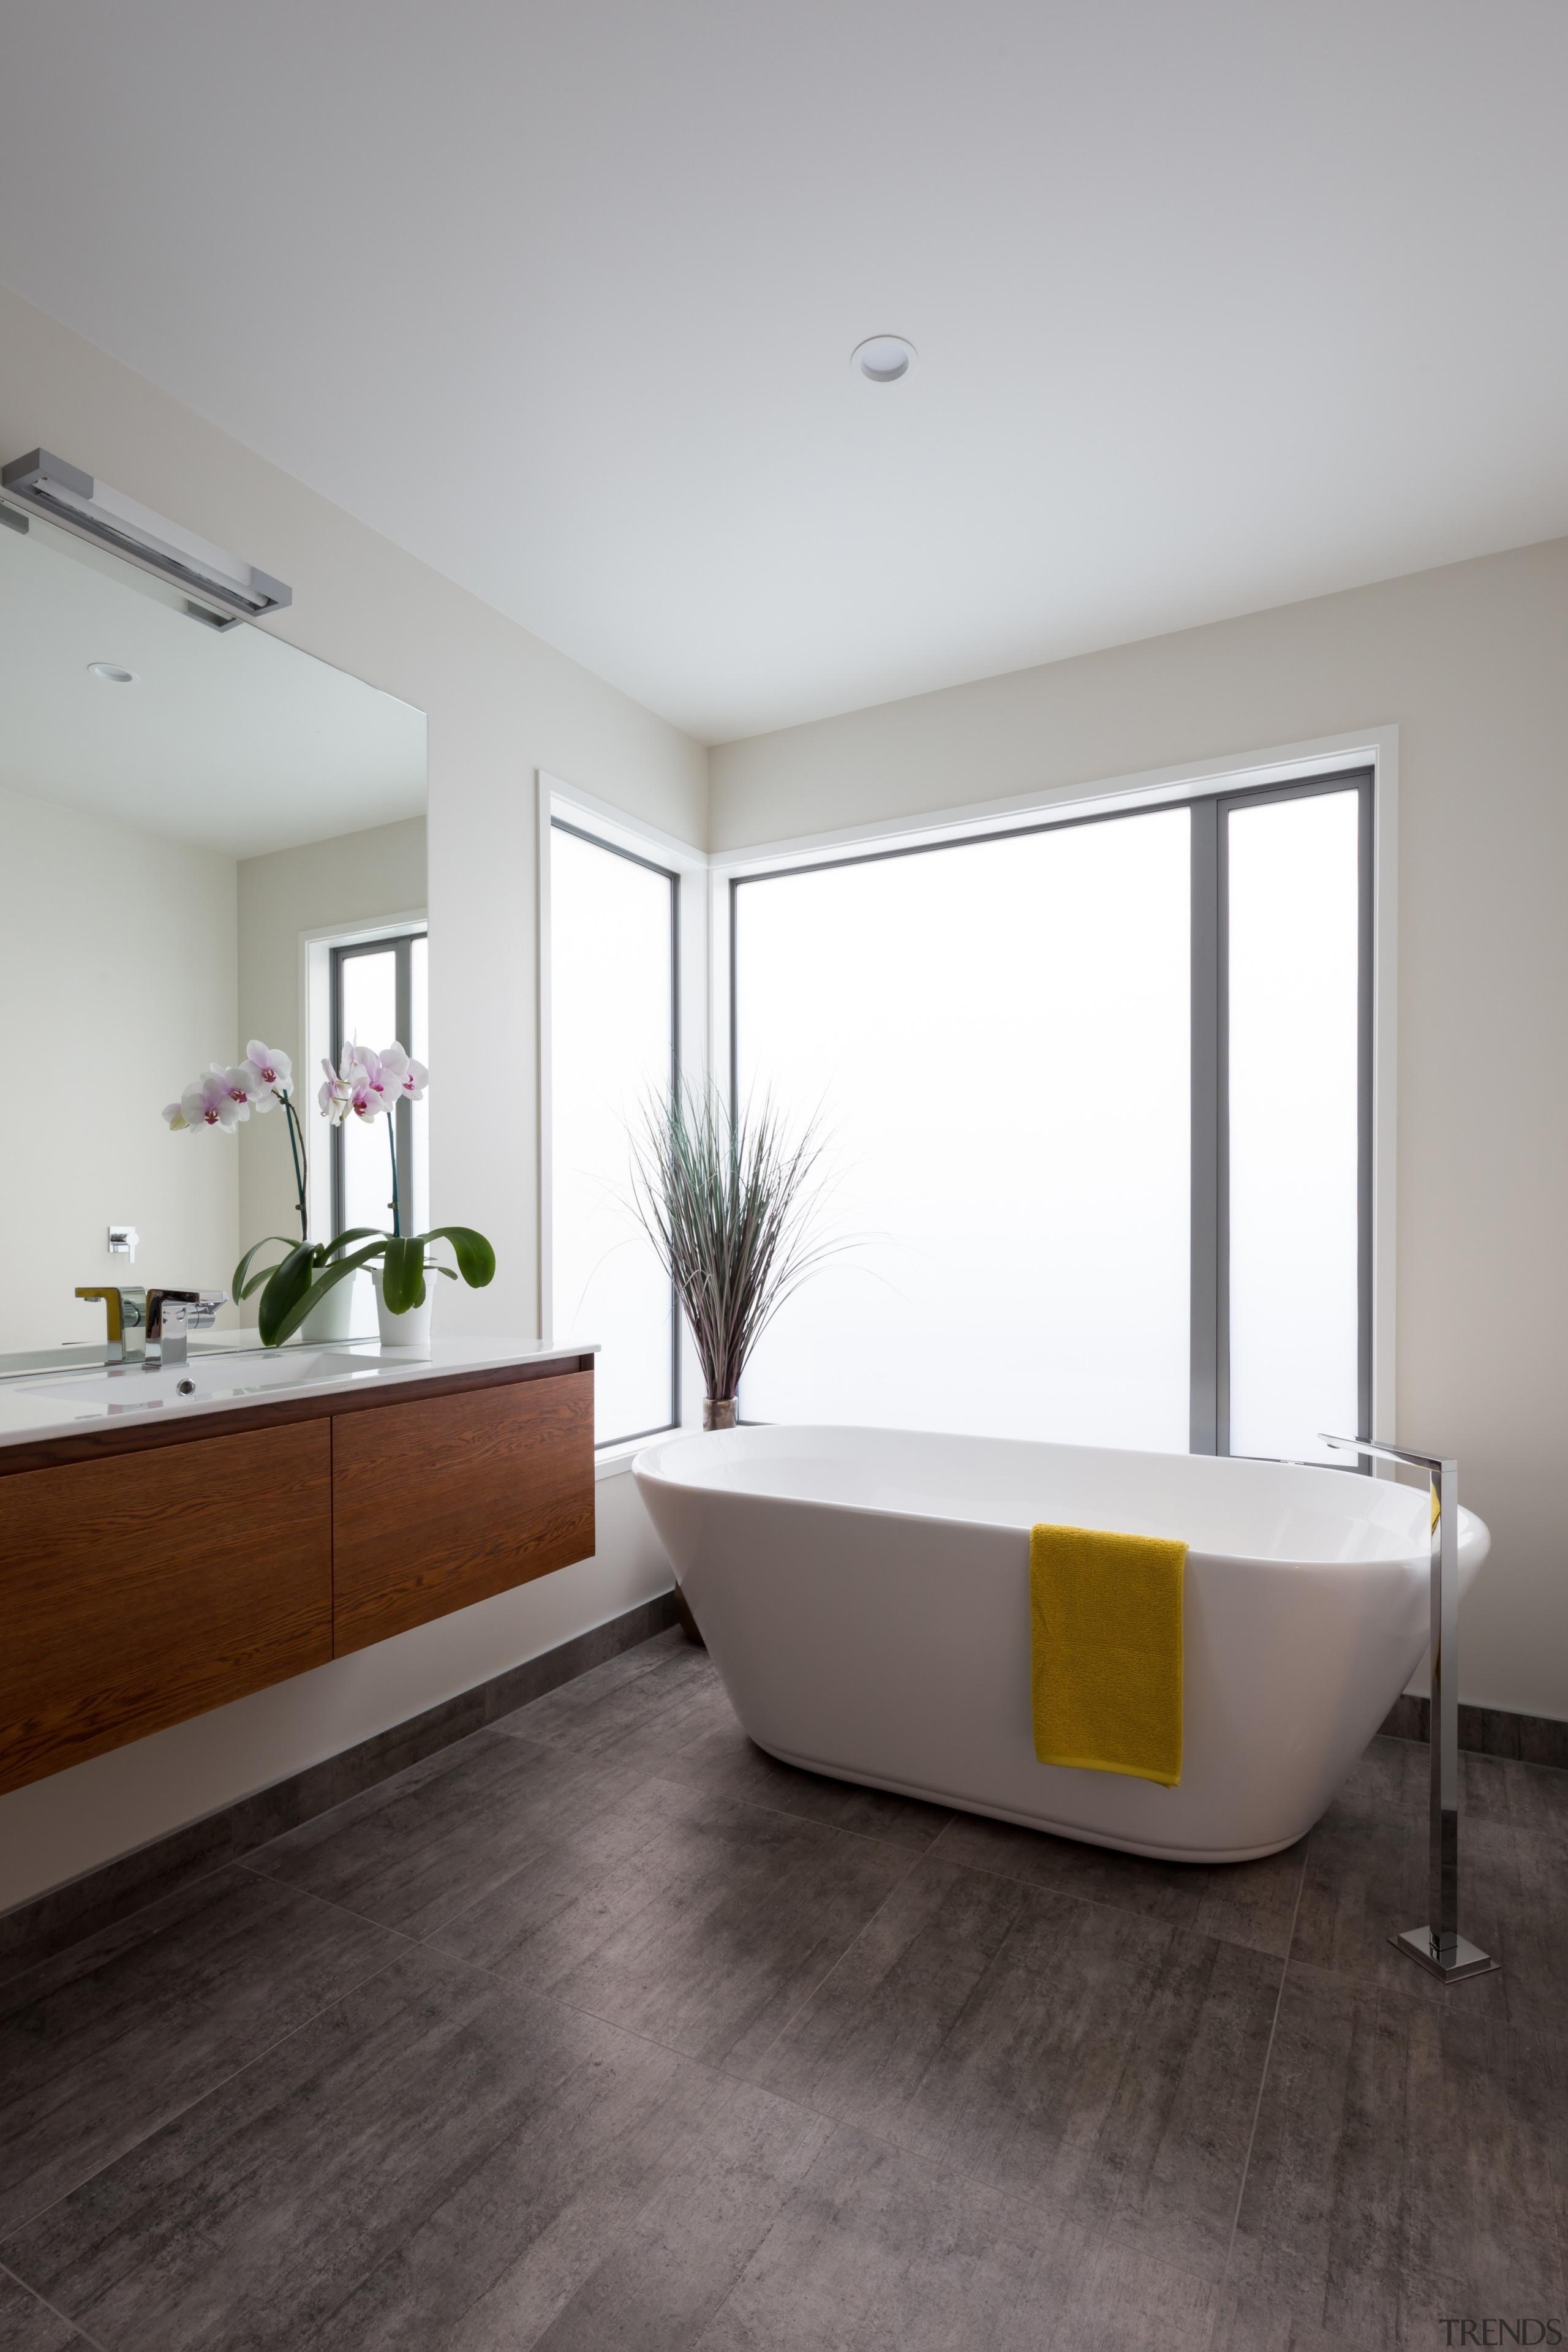 Landmark Homes Riverhead Design Bathroom - Landmark Homes architecture, bathroom, bathtub, floor, flooring, interior design, plumbing fixture, product design, room, window, white, gray